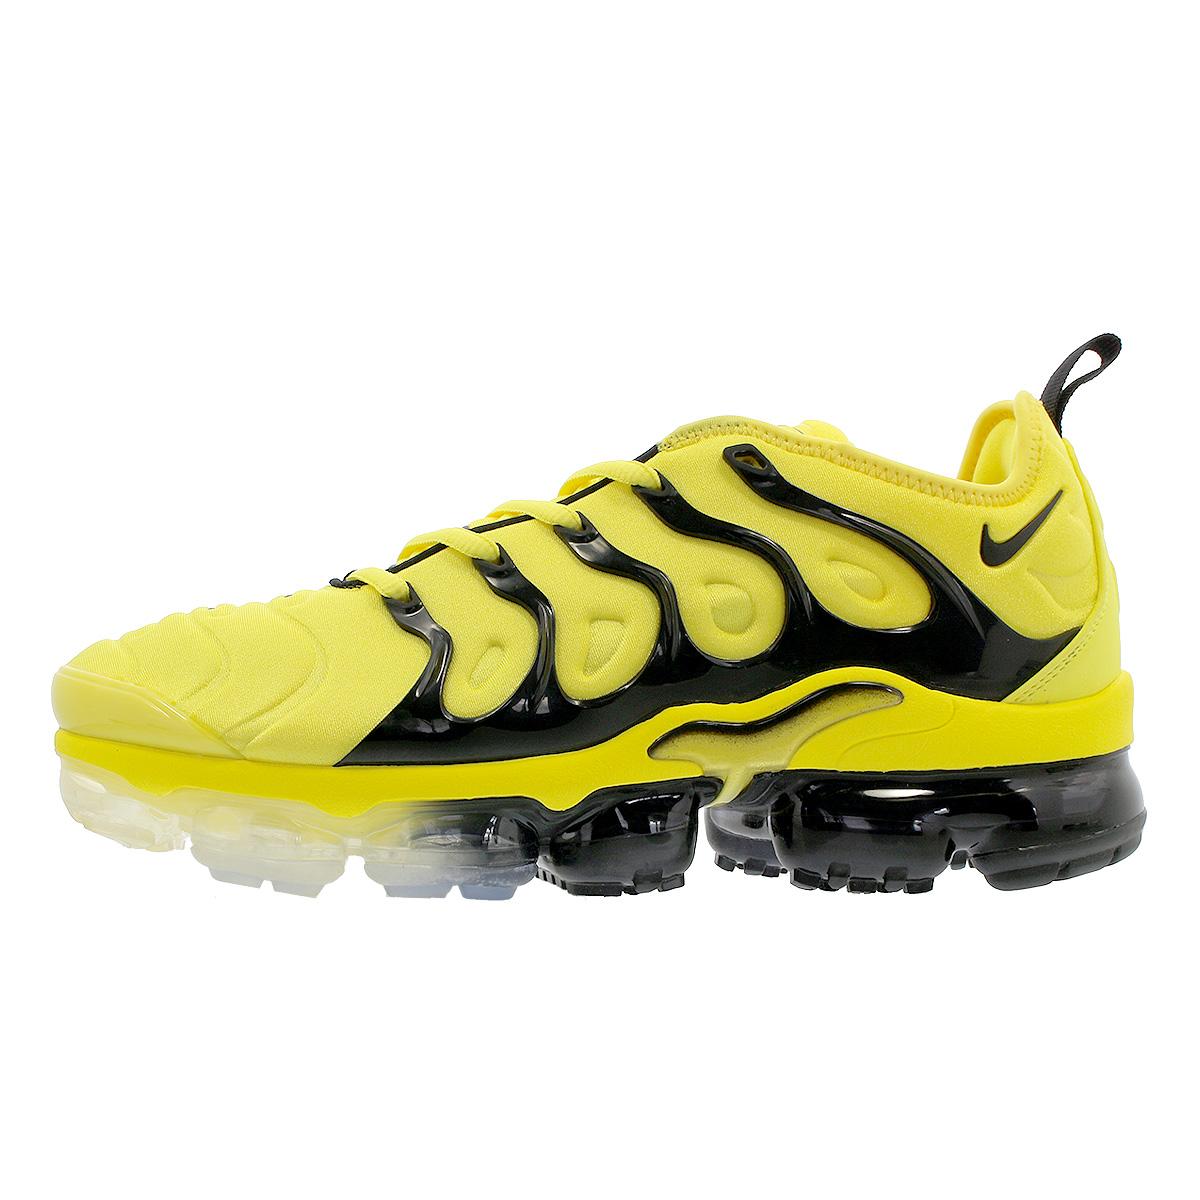 innovative design 740c4 0aa63 NIKE AIR VAPORMAX PLUS Nike vapor max plus YELLOW/BLACK bv6079-700